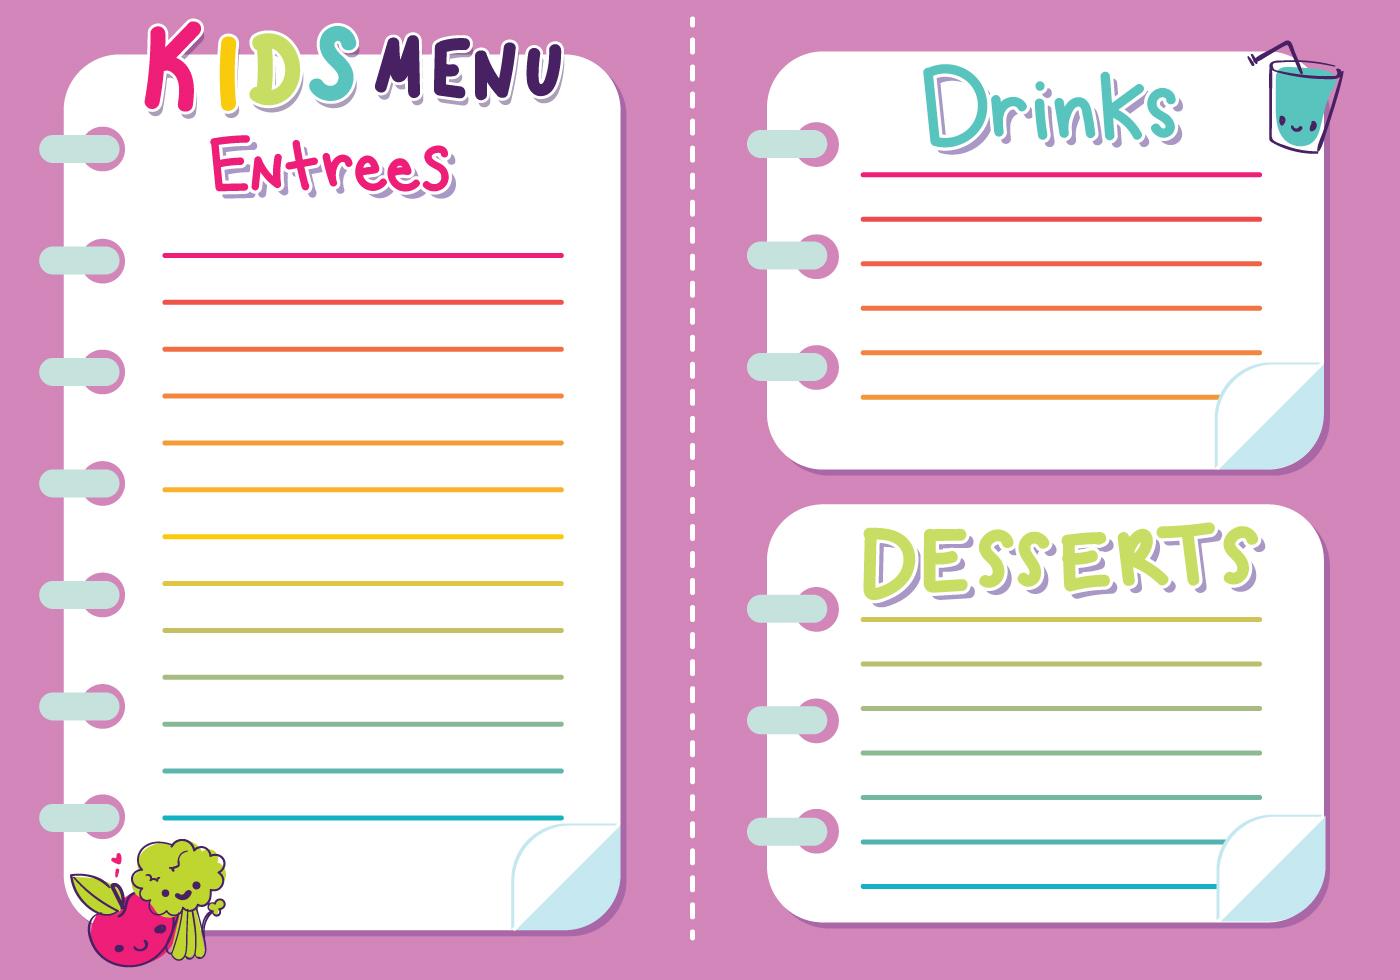 Kids menu vector girls download free vector art stock graphics kids menu vector girls download free vector art stock graphics images maxwellsz